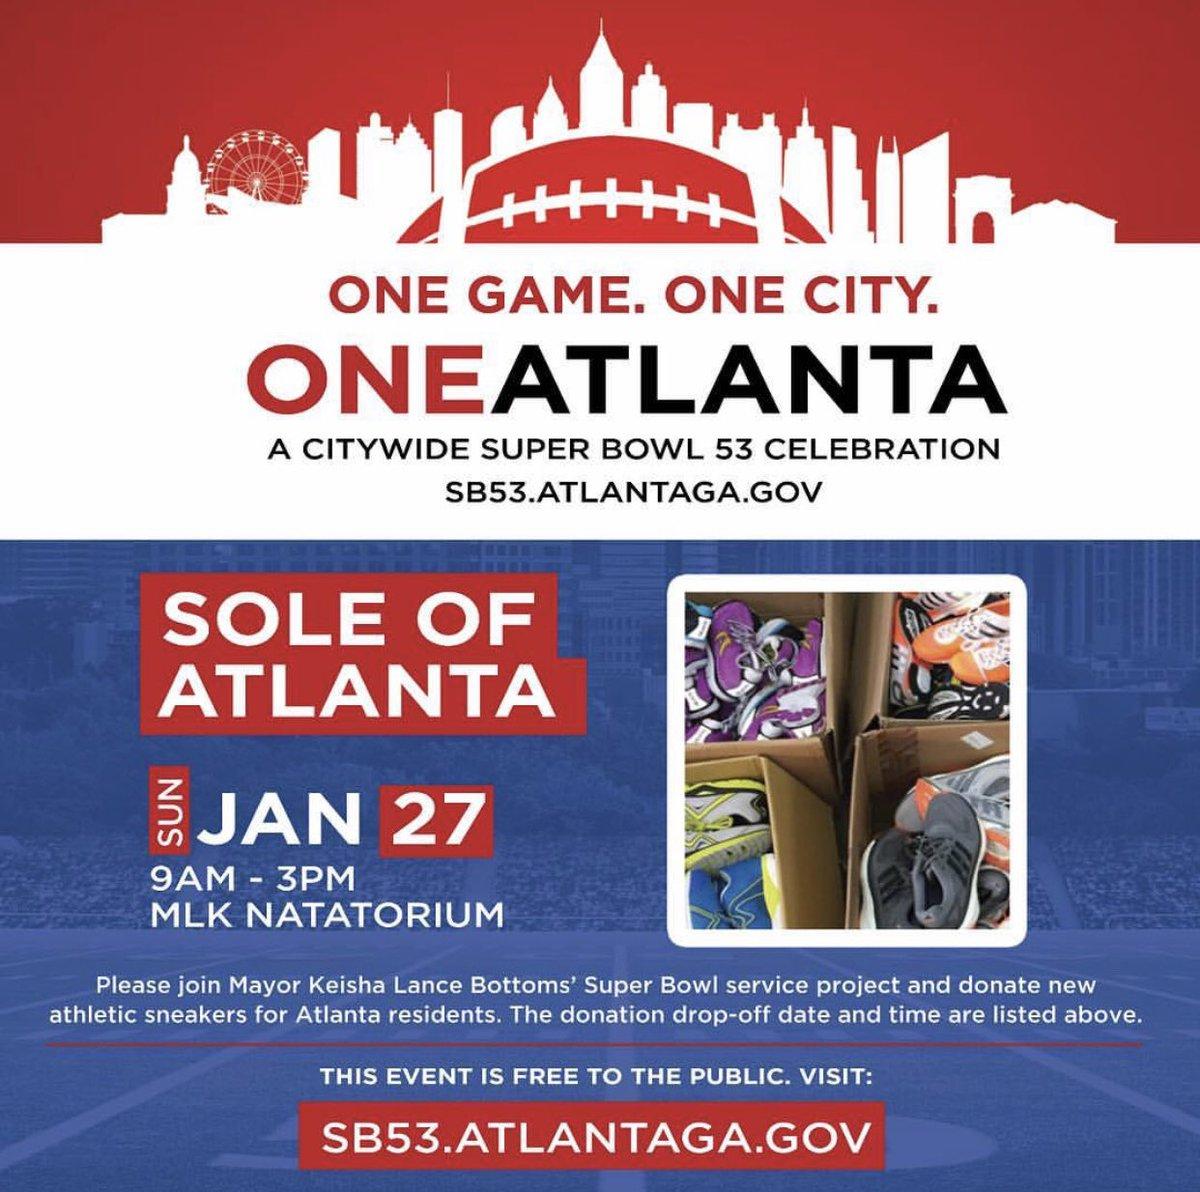 City of Atlanta, GA on Twitter: